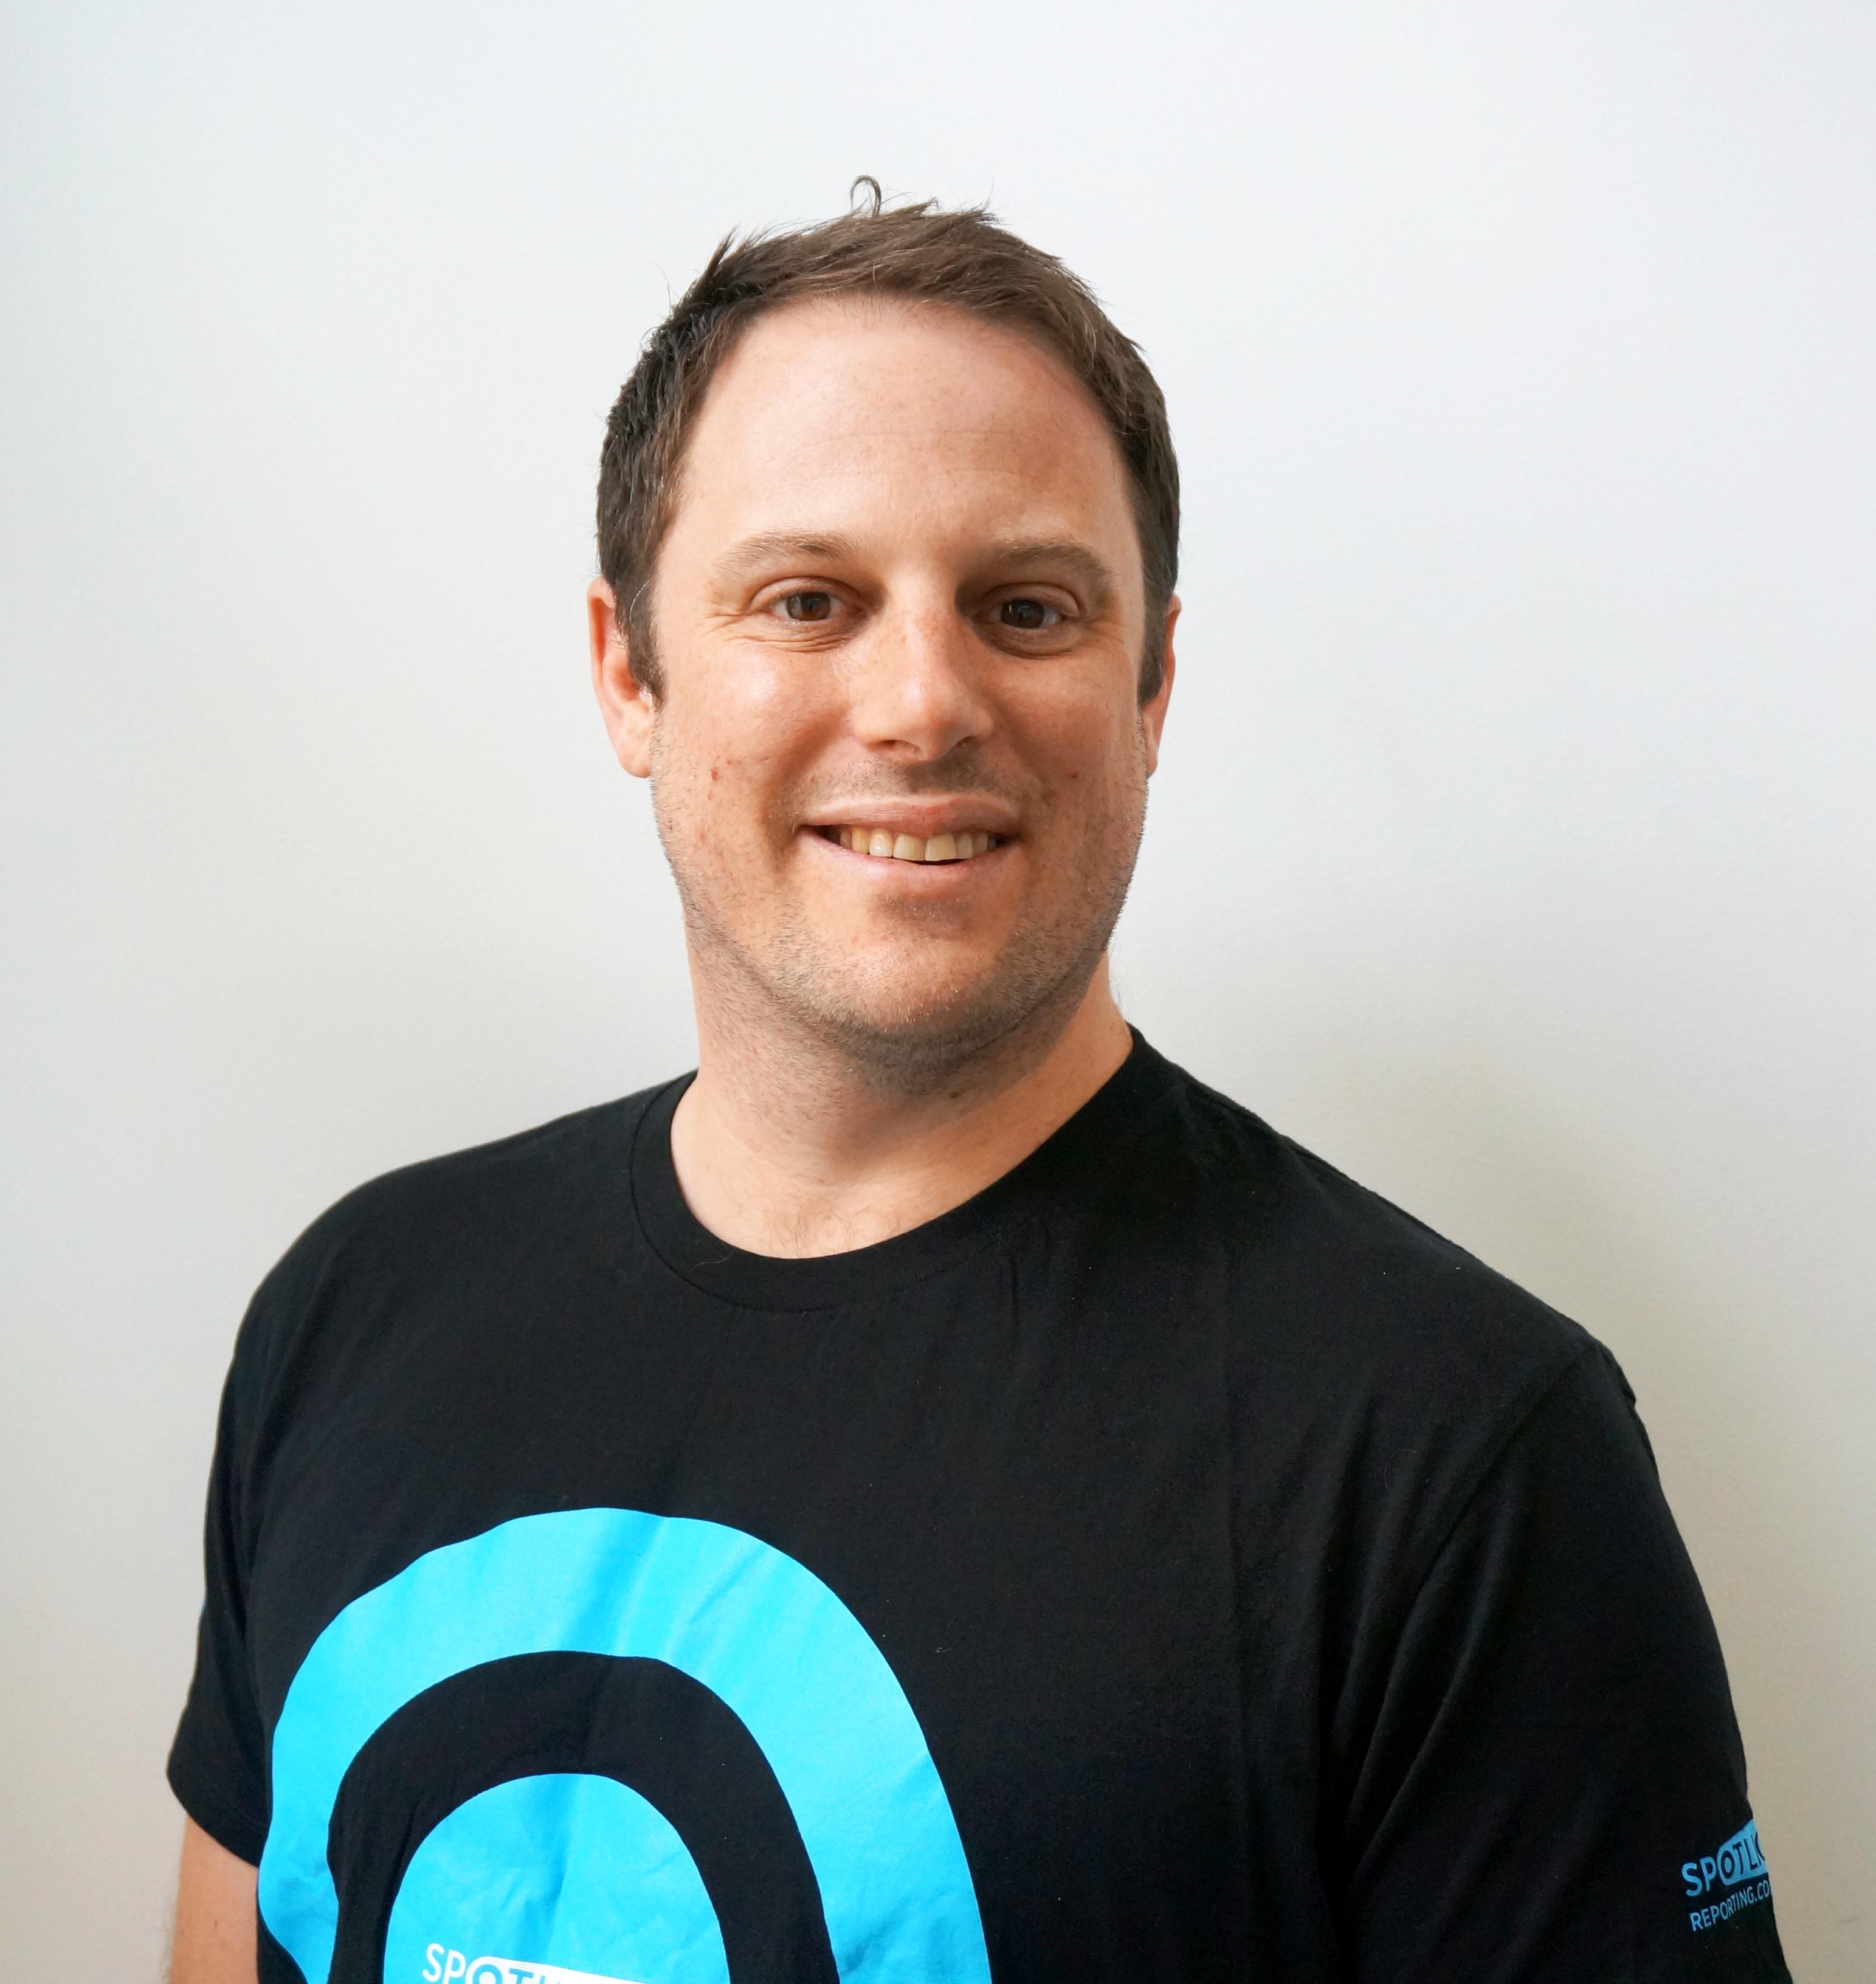 Thomas Loosley Senior Account Manager NZ Spotligh Reporting 2.jpg